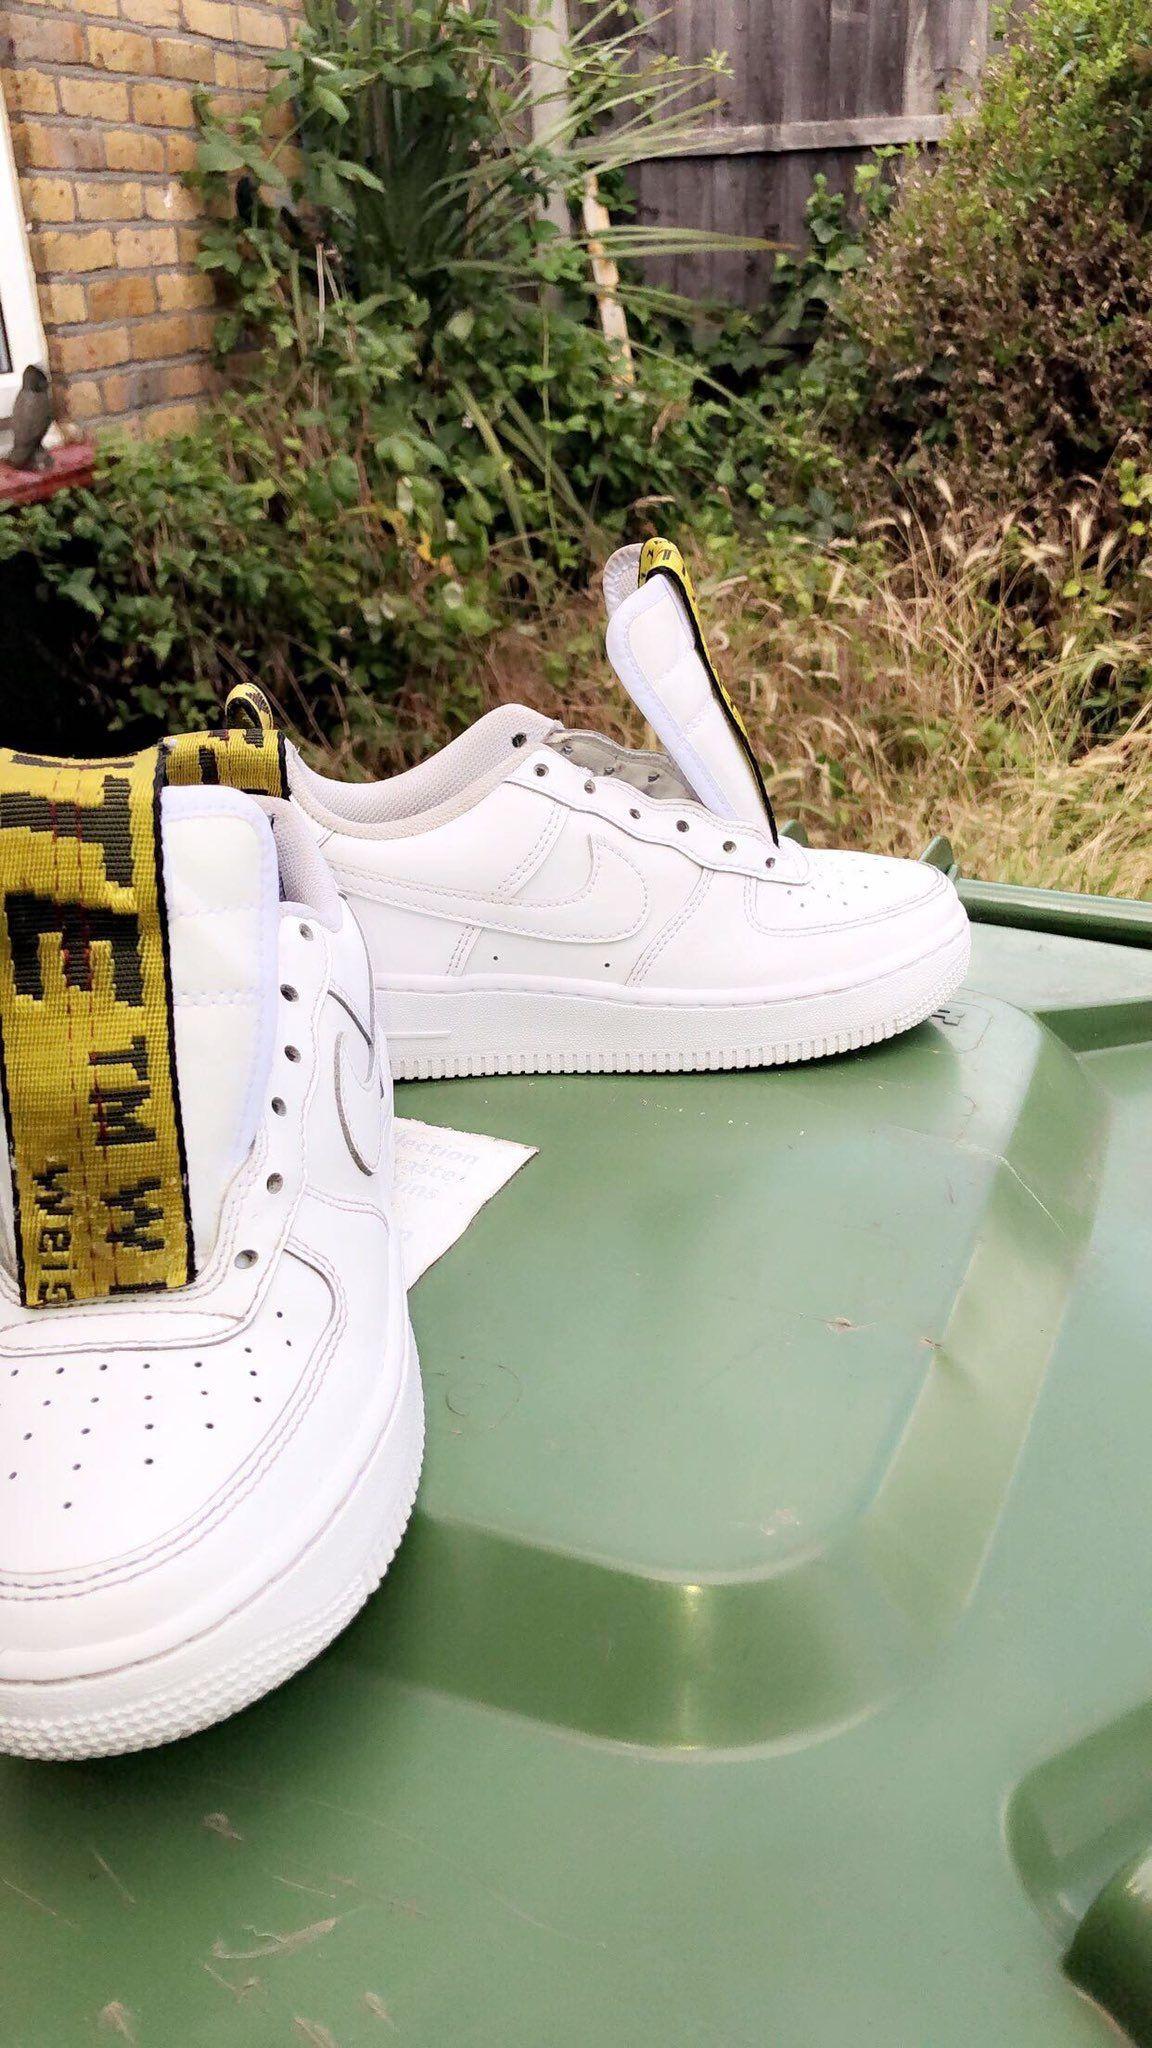 Pin by 🦋 ᔕ ᗩ ᔕ ᕼ ᗩ 🦋 on S H O E S ♡ Vans sneaker